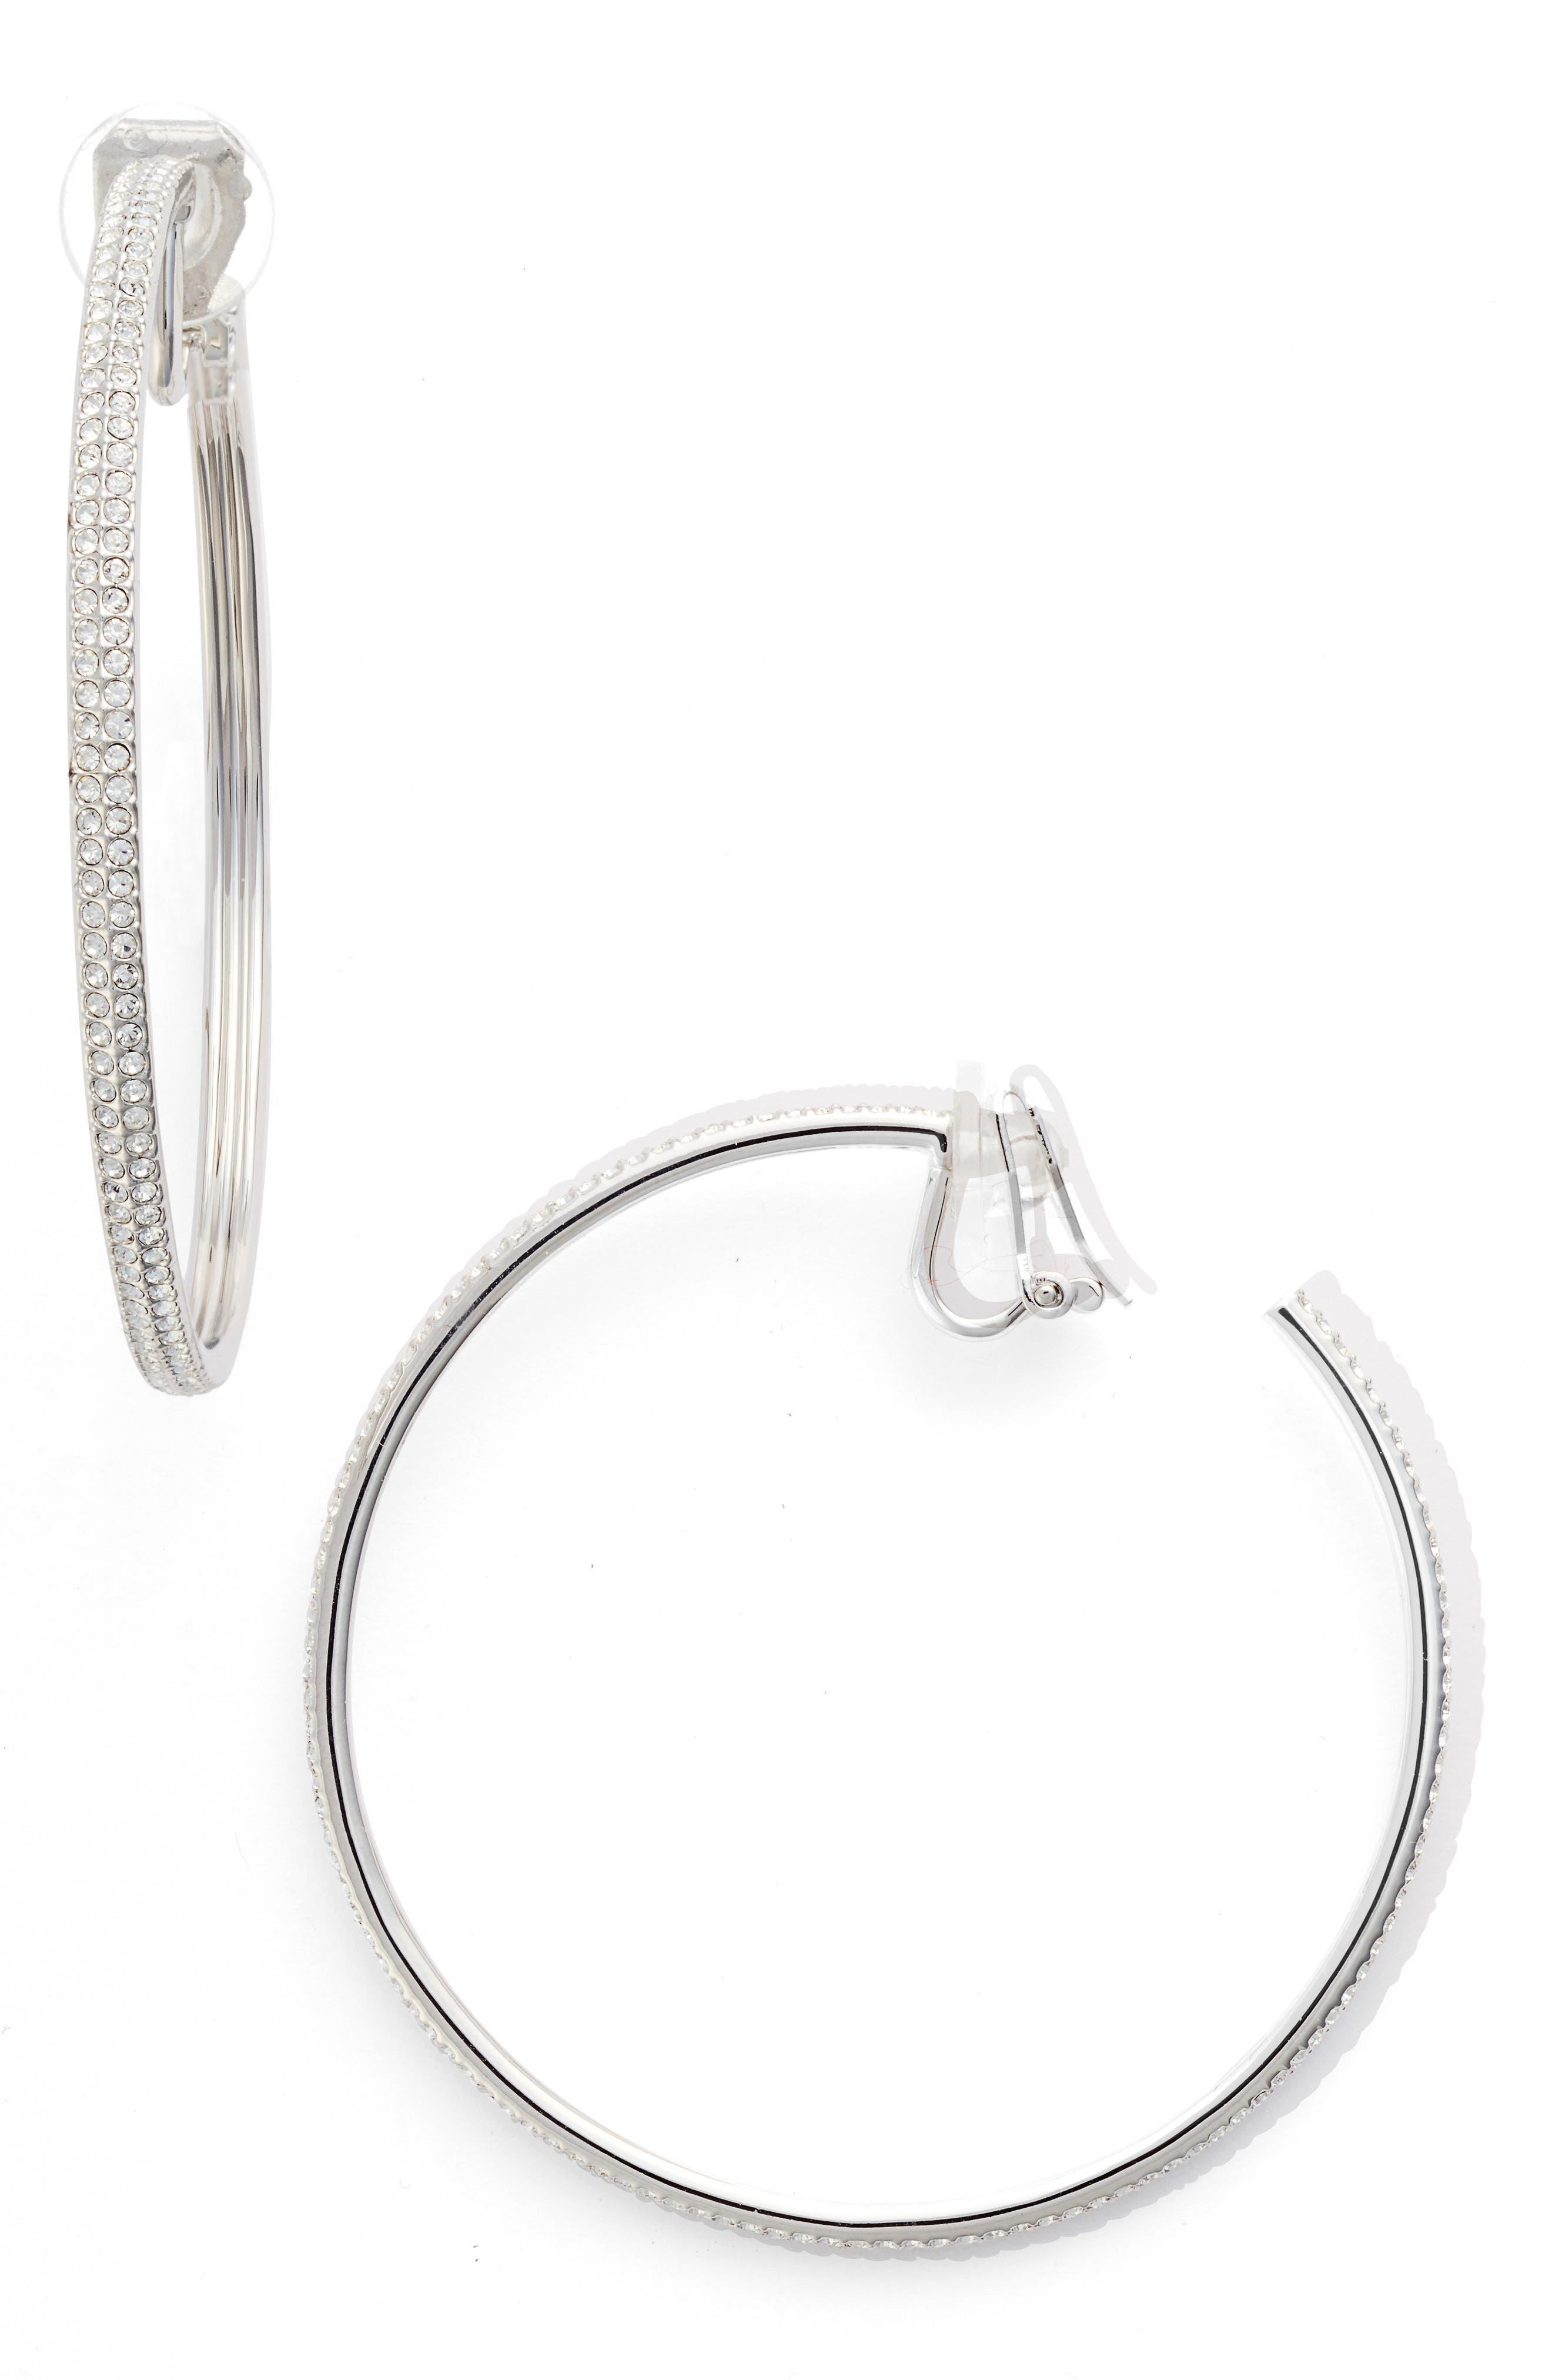 Large Hoop Earrings,                             Main thumbnail 1, color,                             SILVER